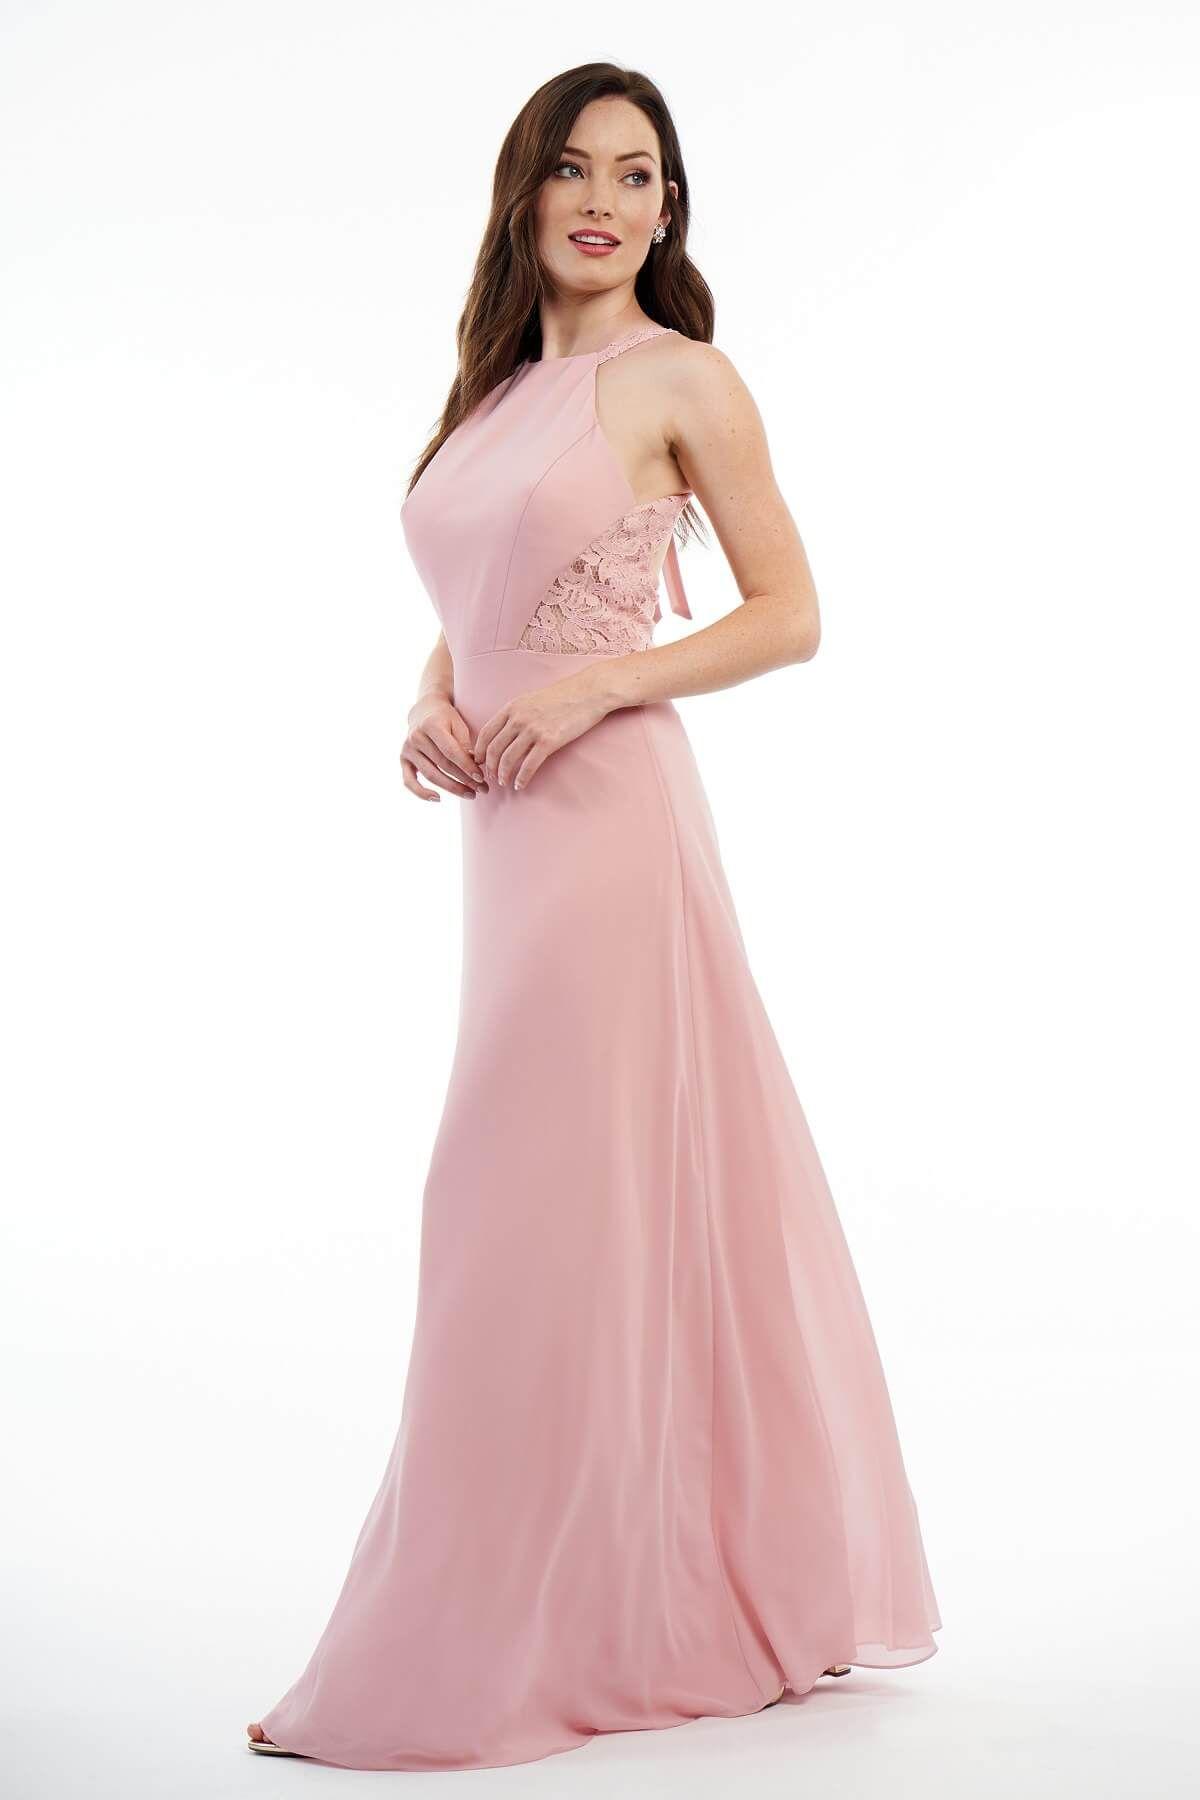 a089a397e5357 Jasmine Bridesmaids Dresses, Beautiful Bridesmaid Dresses, Bridal Party  Dresses, Event Dresses, Jasmine